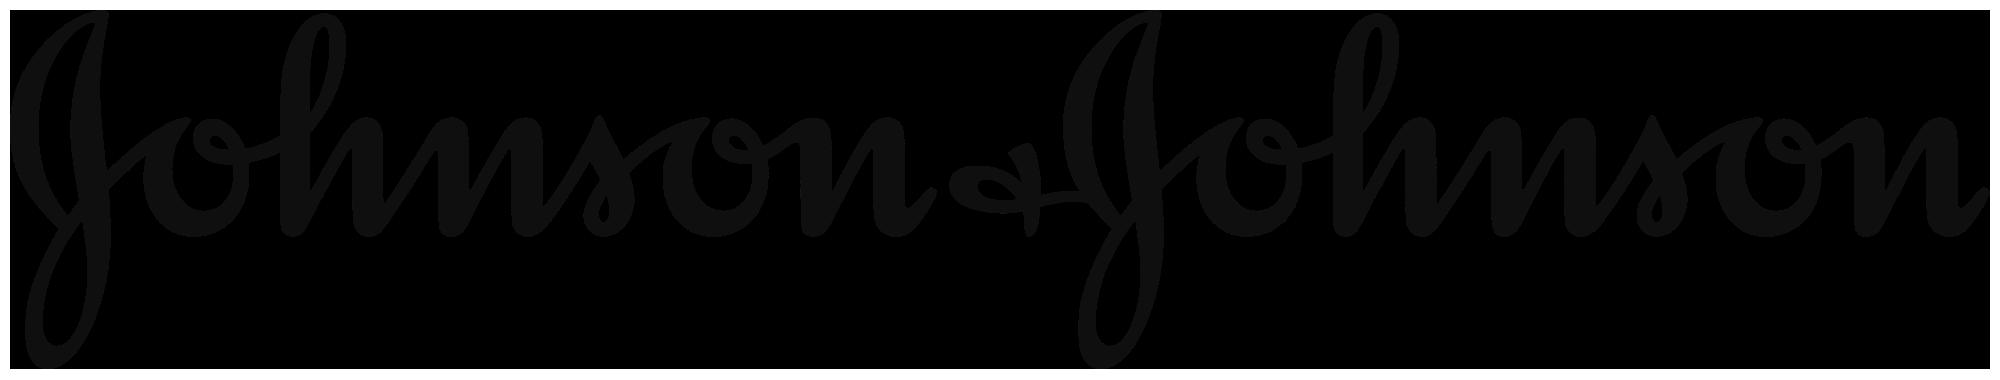 Client - Johnson&Johnson - logo black